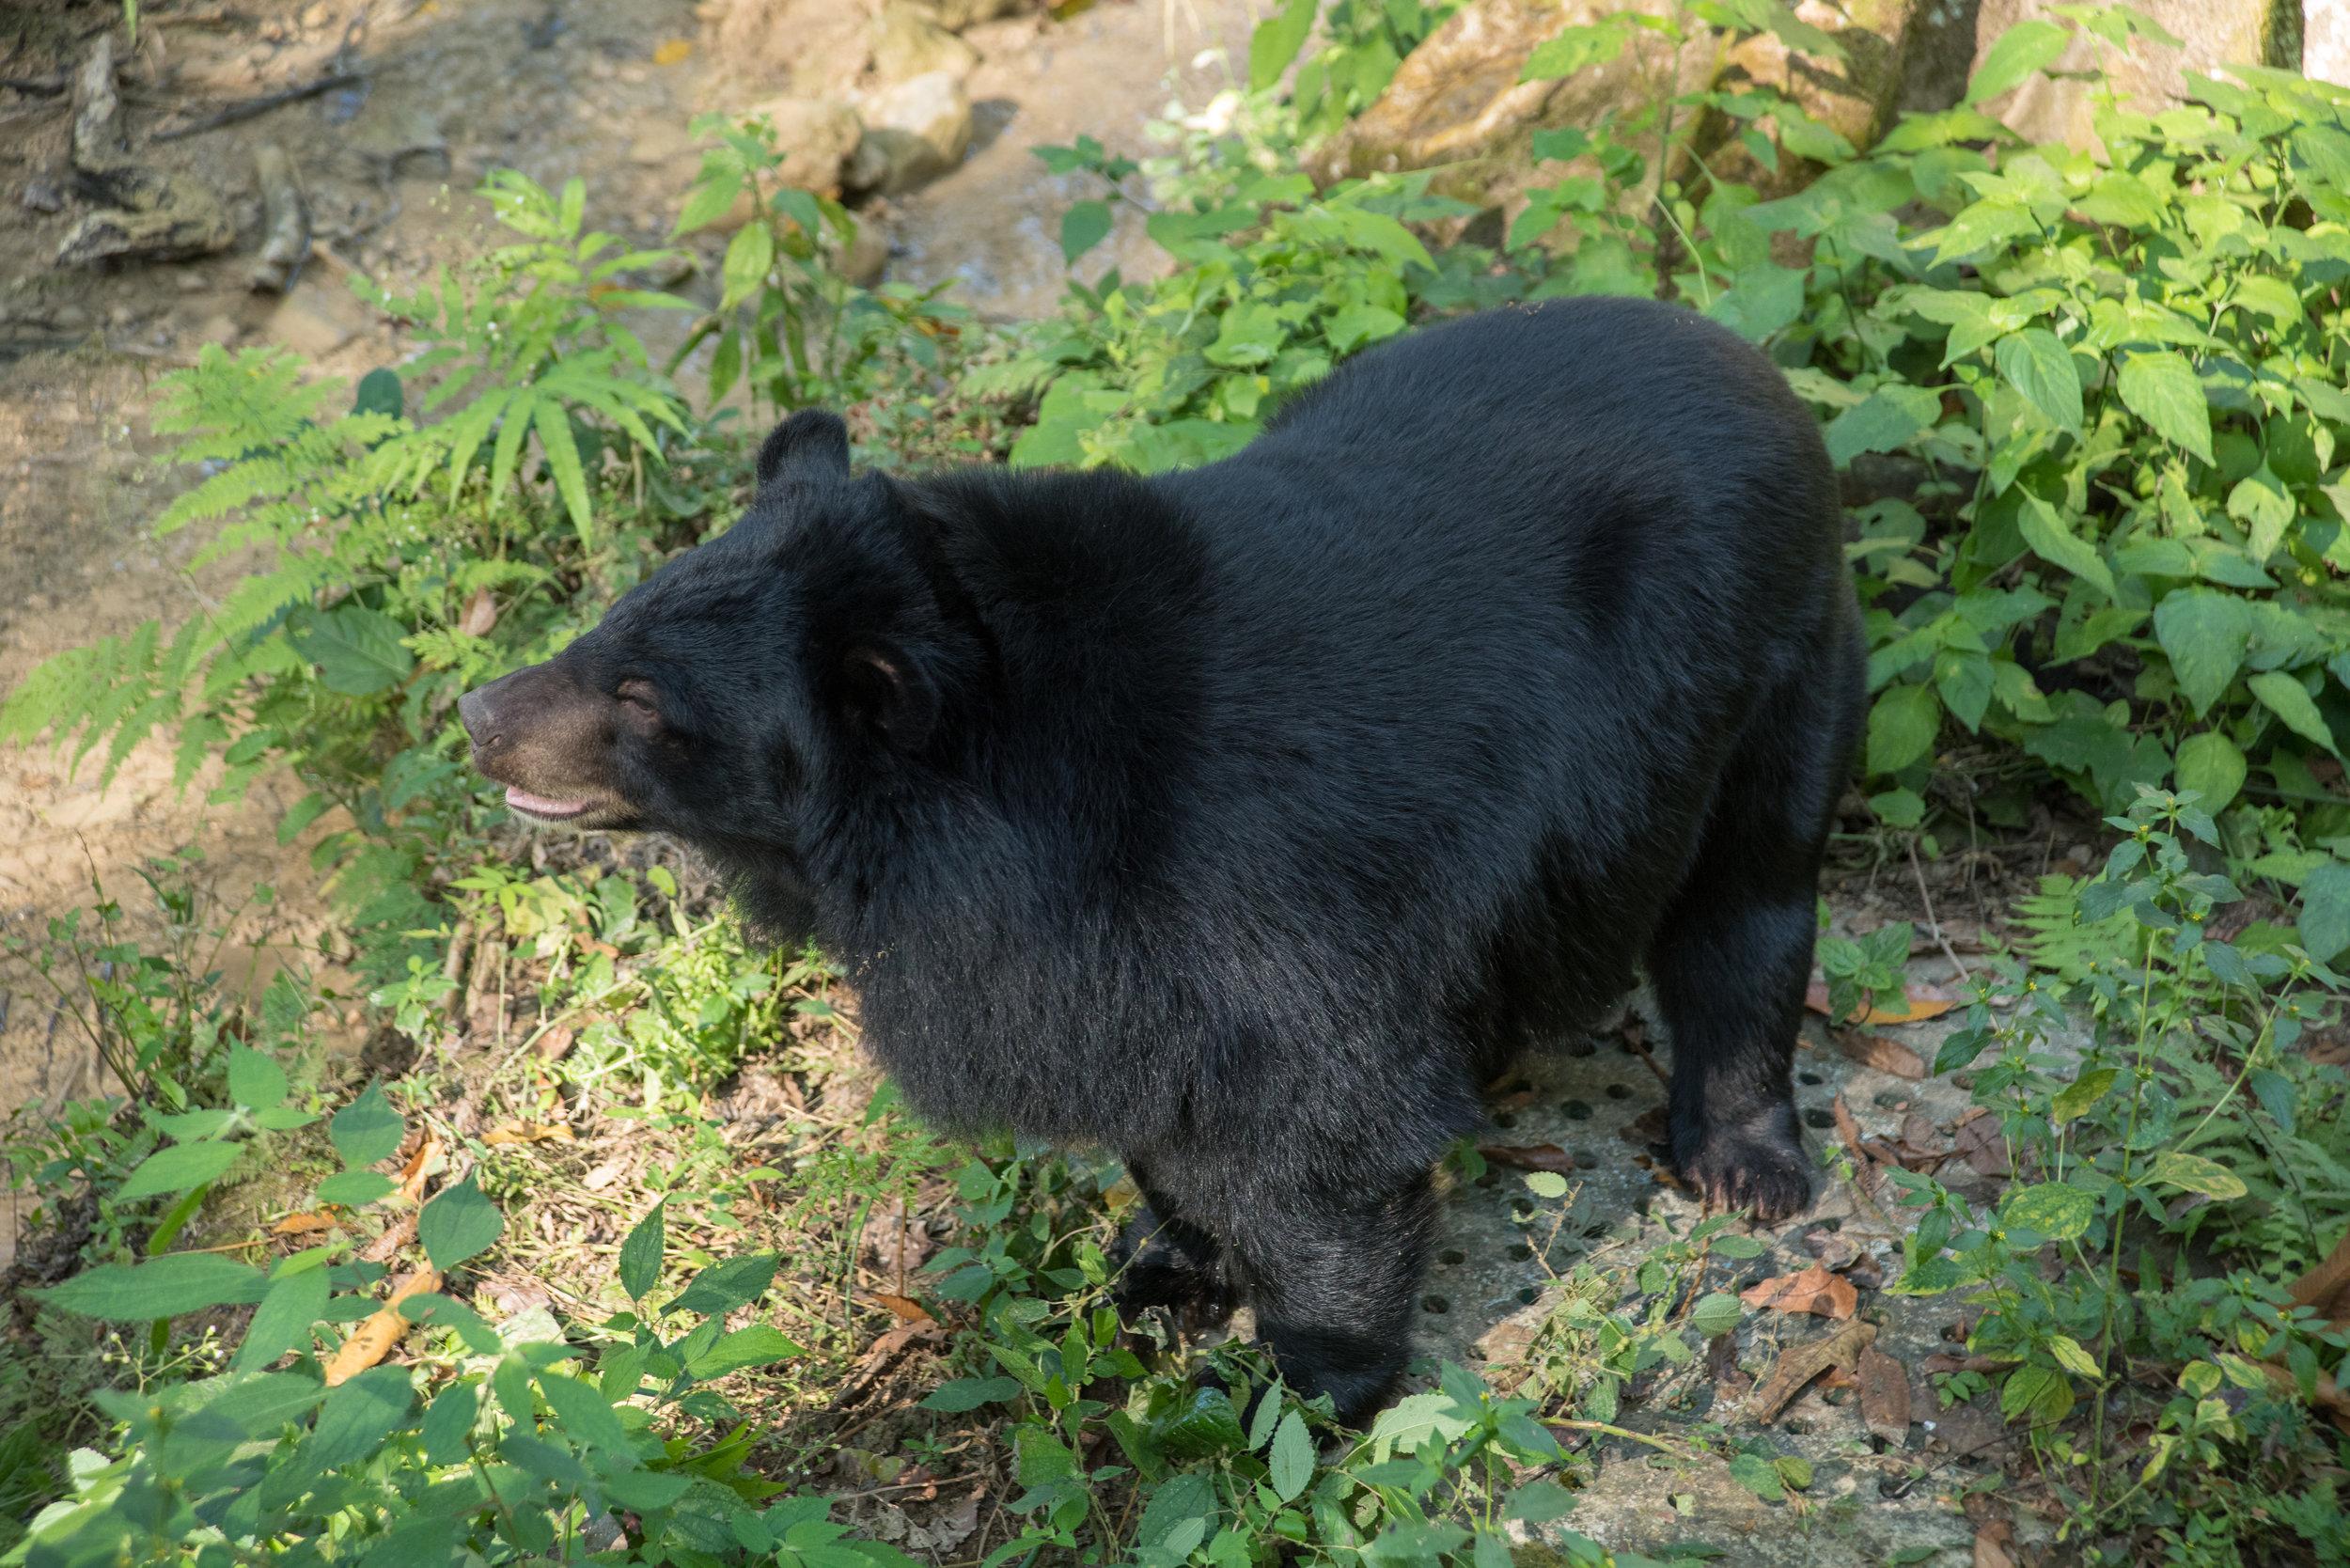 Asiatic Black (Moon) bear, Tat Kouang Si Bear Rescue Centre, Luang Prabang, Laos